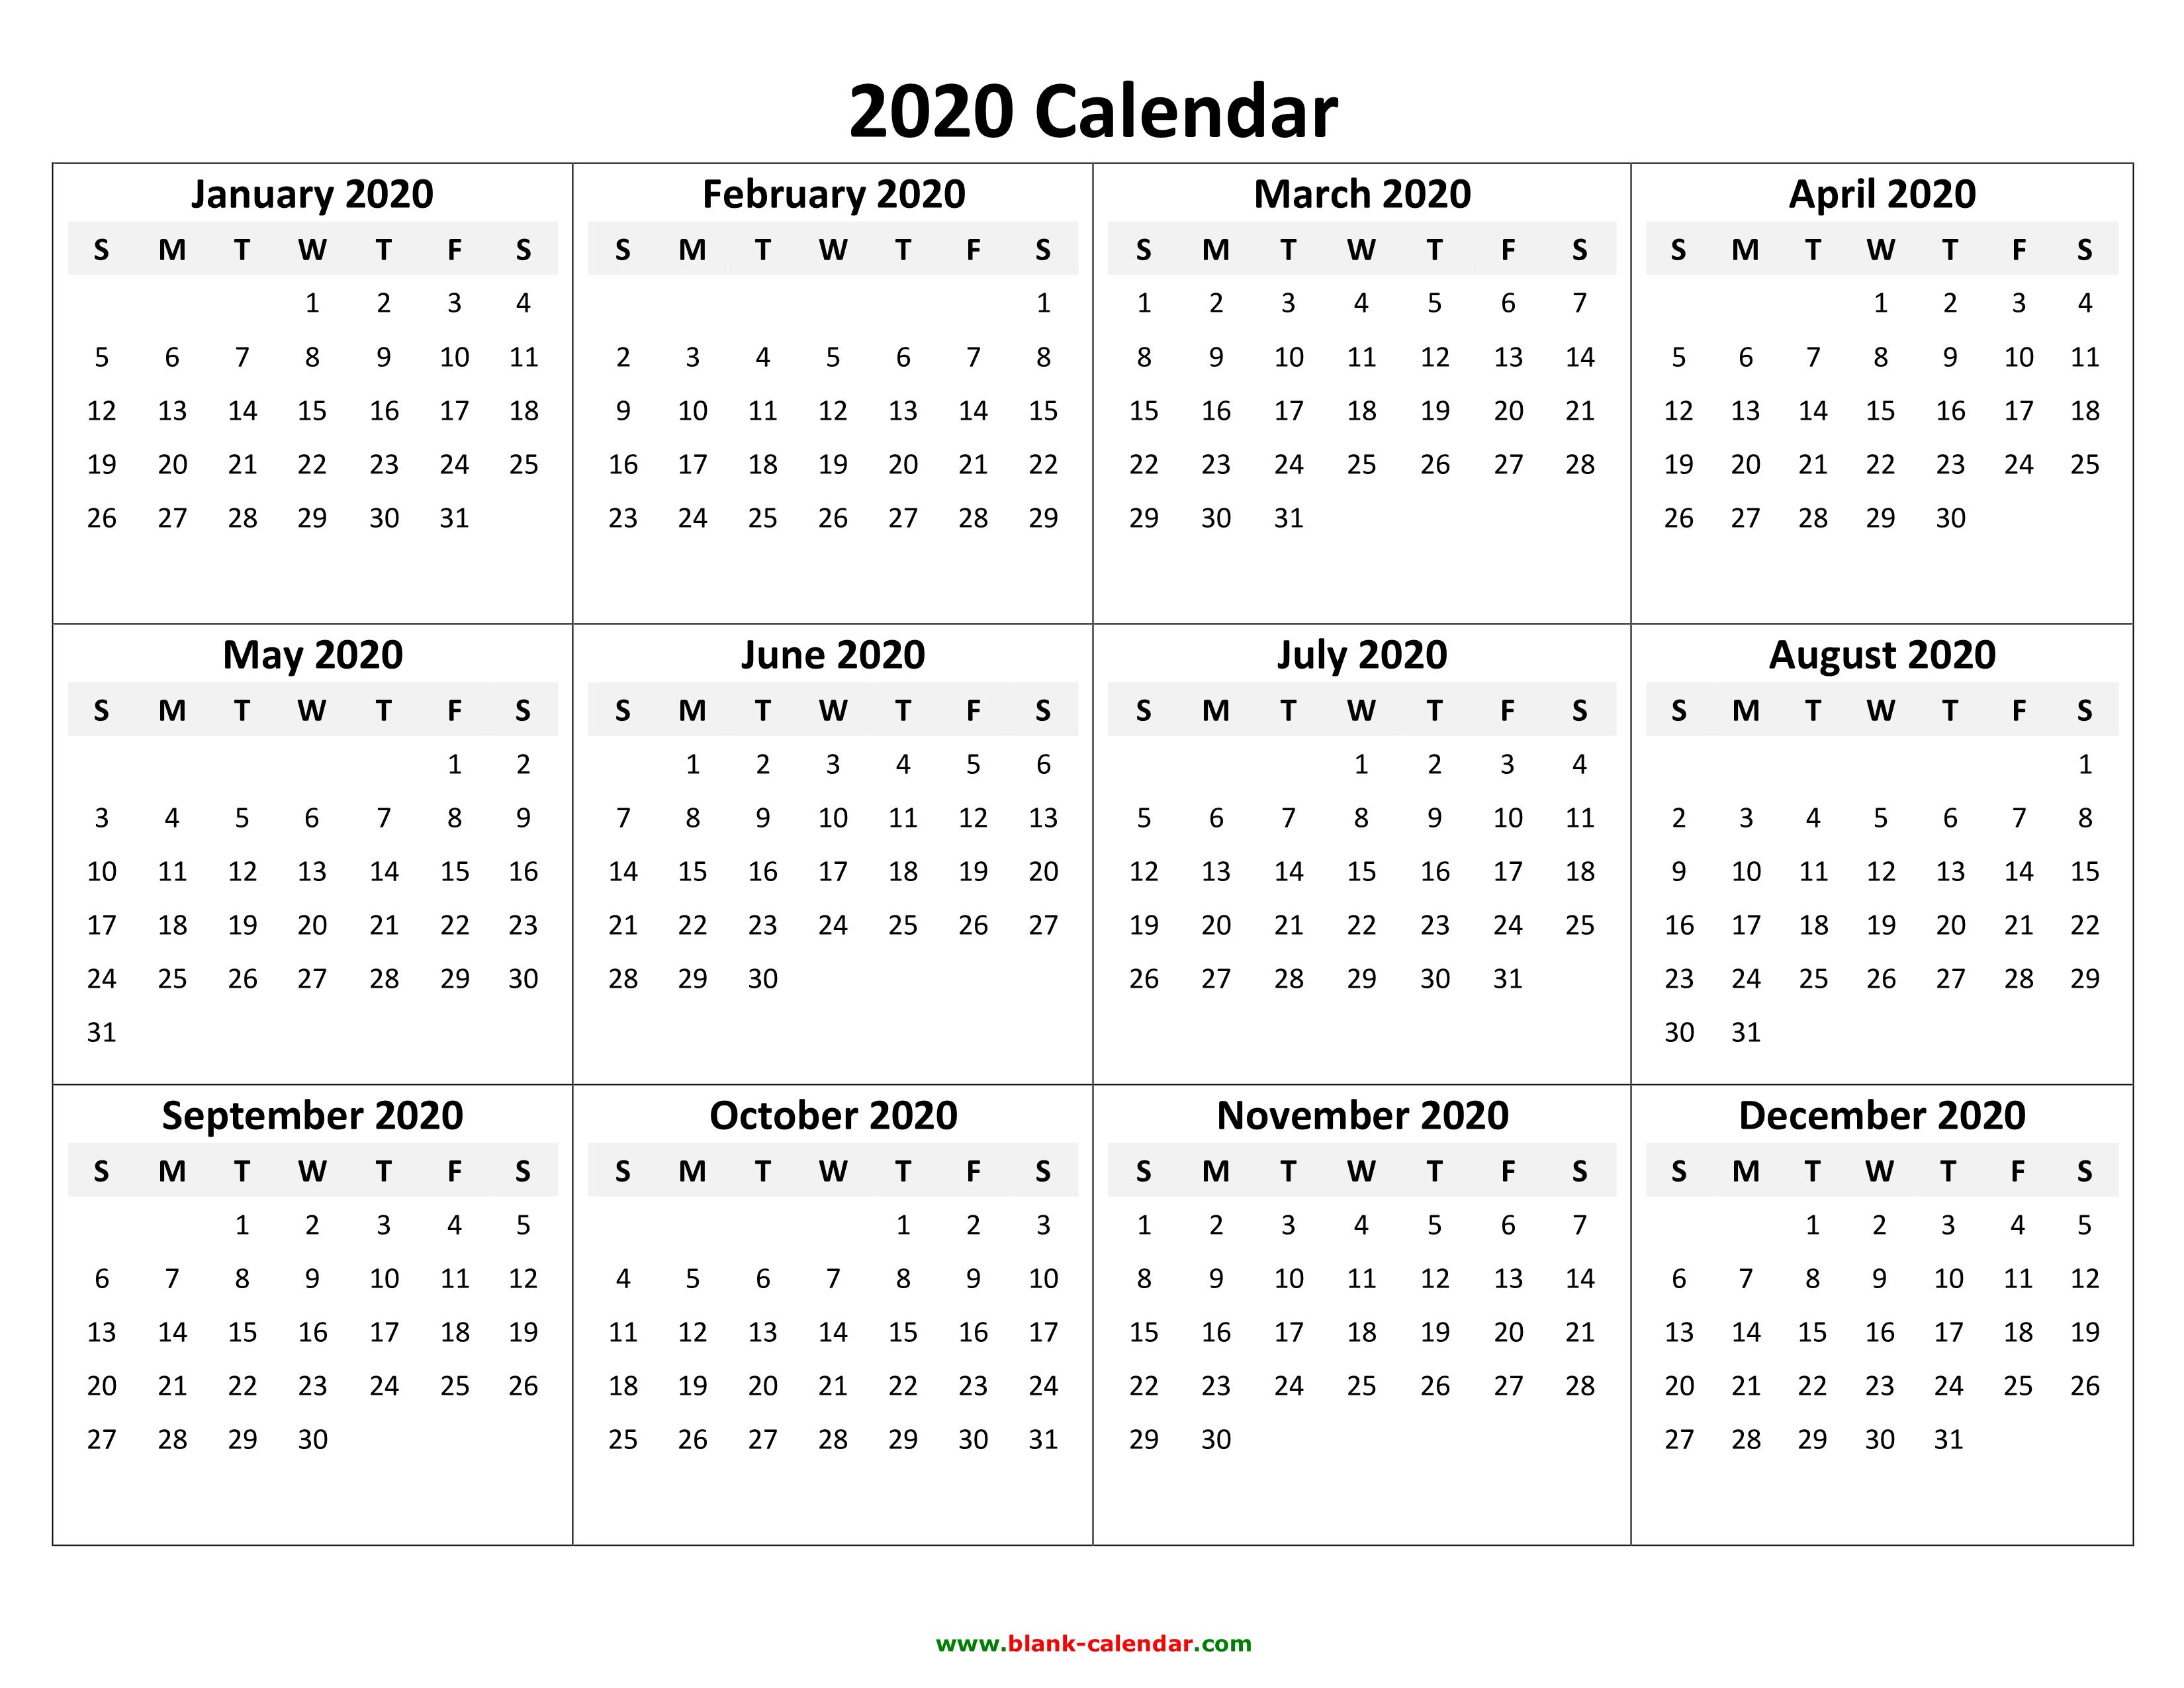 Free 2020 Calendar Printable Pdf.2019 Calendar 2020 Printable Word Free Printable Calendars And